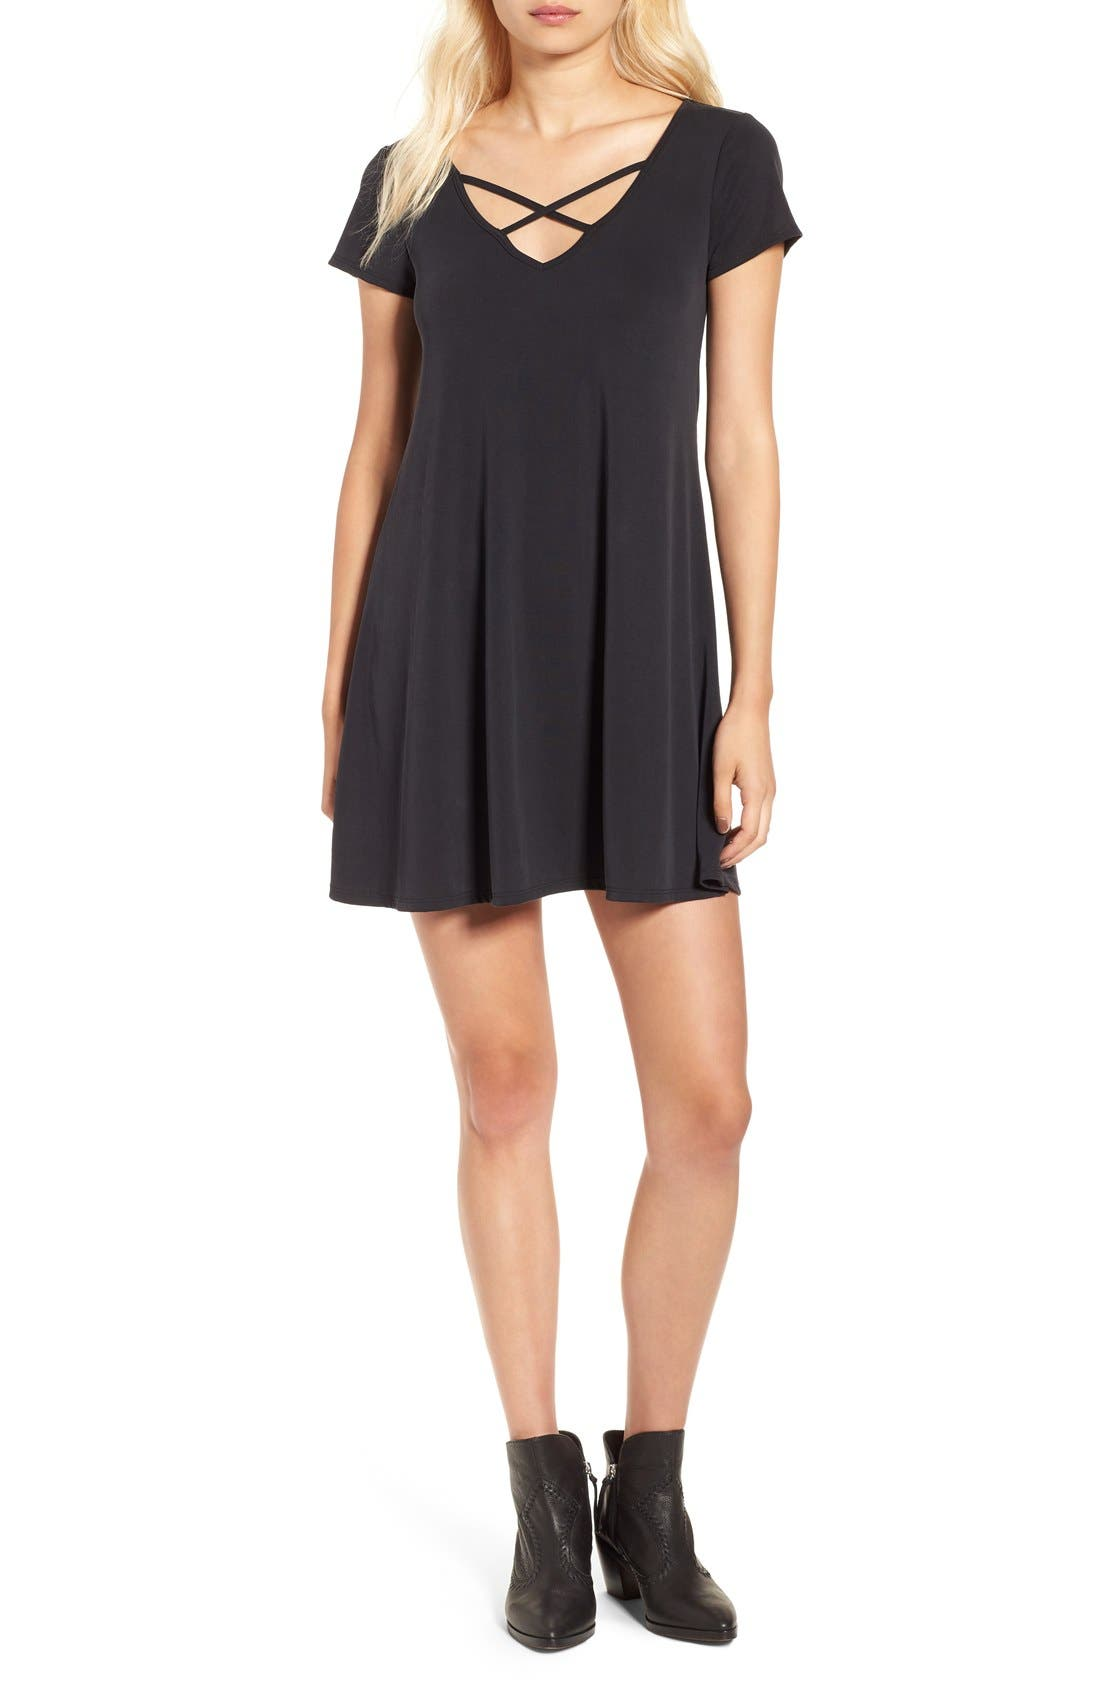 SOCIALITE,                             Cross Front T-Shirt Dress,                             Main thumbnail 1, color,                             001